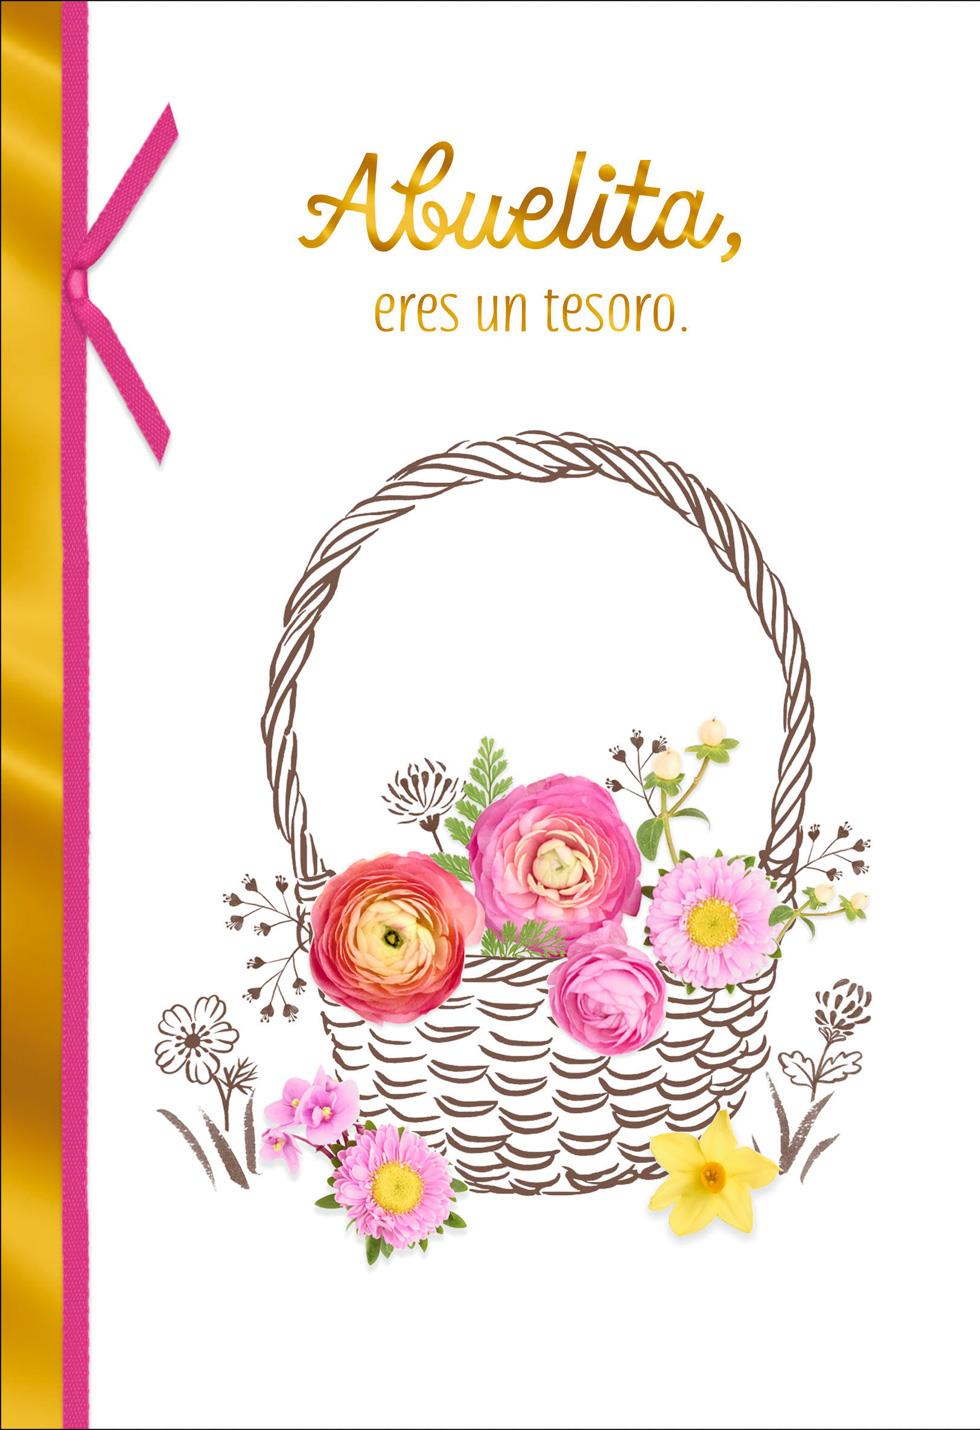 Flower basket spanish language birthday card for grandma greeting flower basket spanish language birthday card for grandma izmirmasajfo